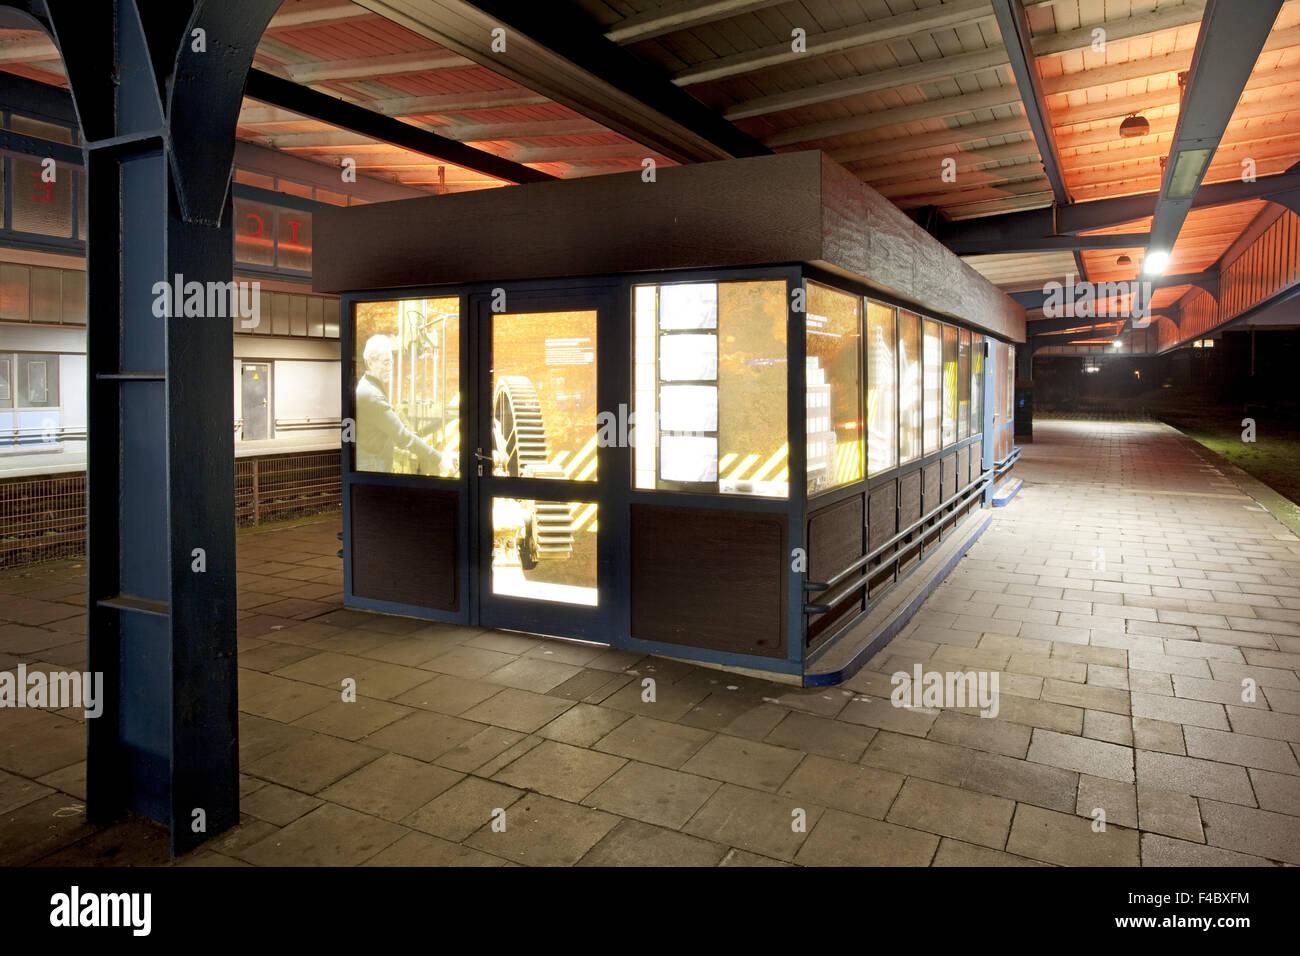 Museum station platform Oberhausen, Germany - Stock Image